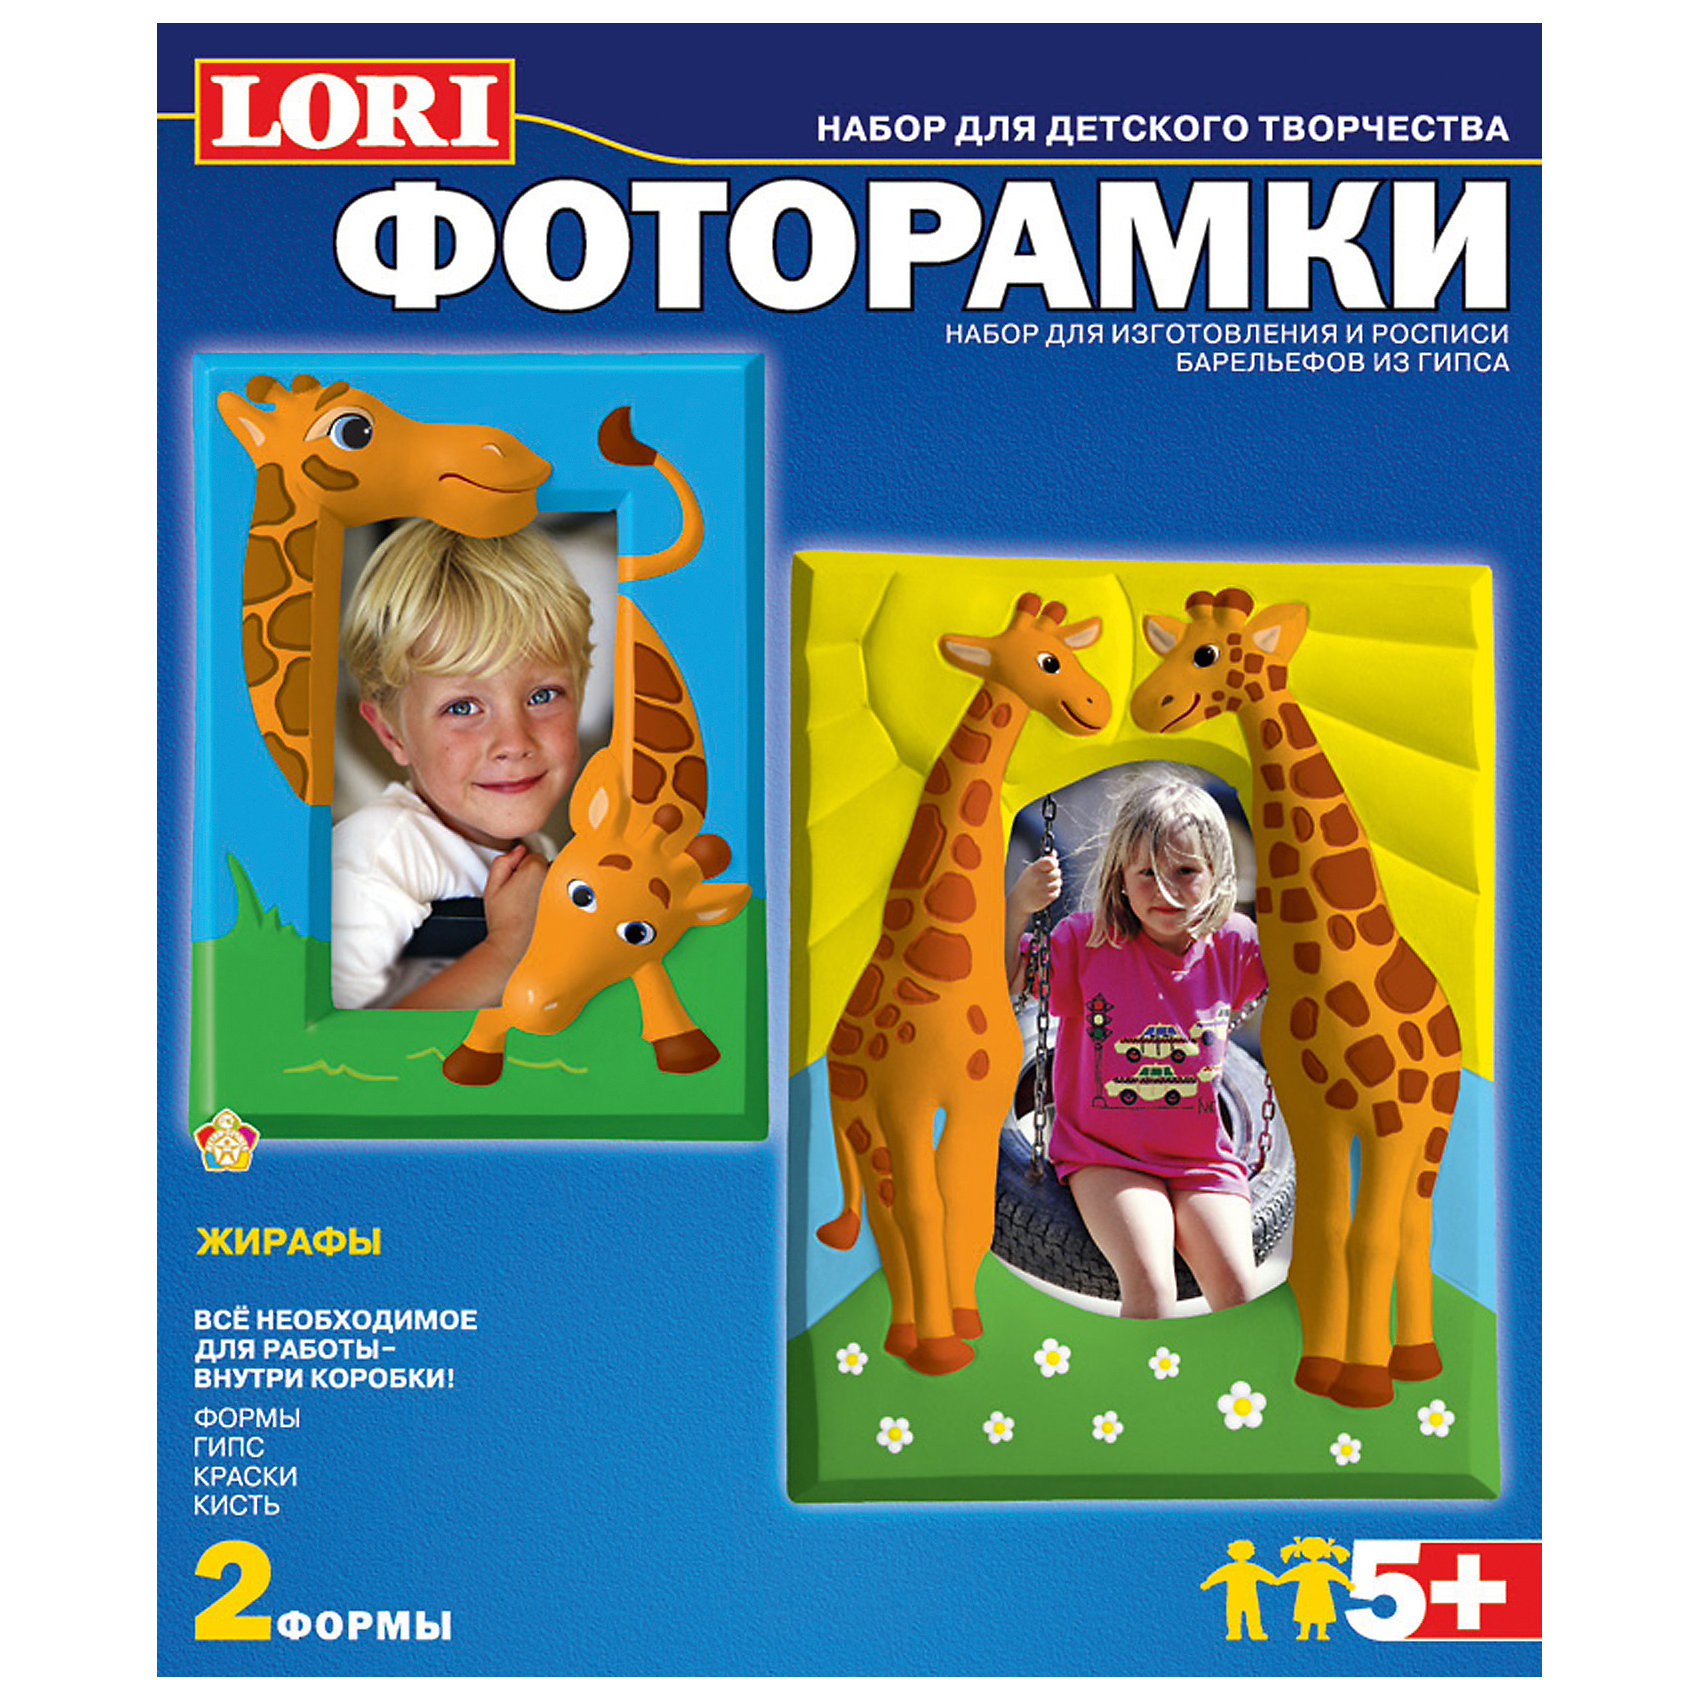 LORI Фоторамки из гипса  «Жирафы» lori фоторамки из гипса на клумбе